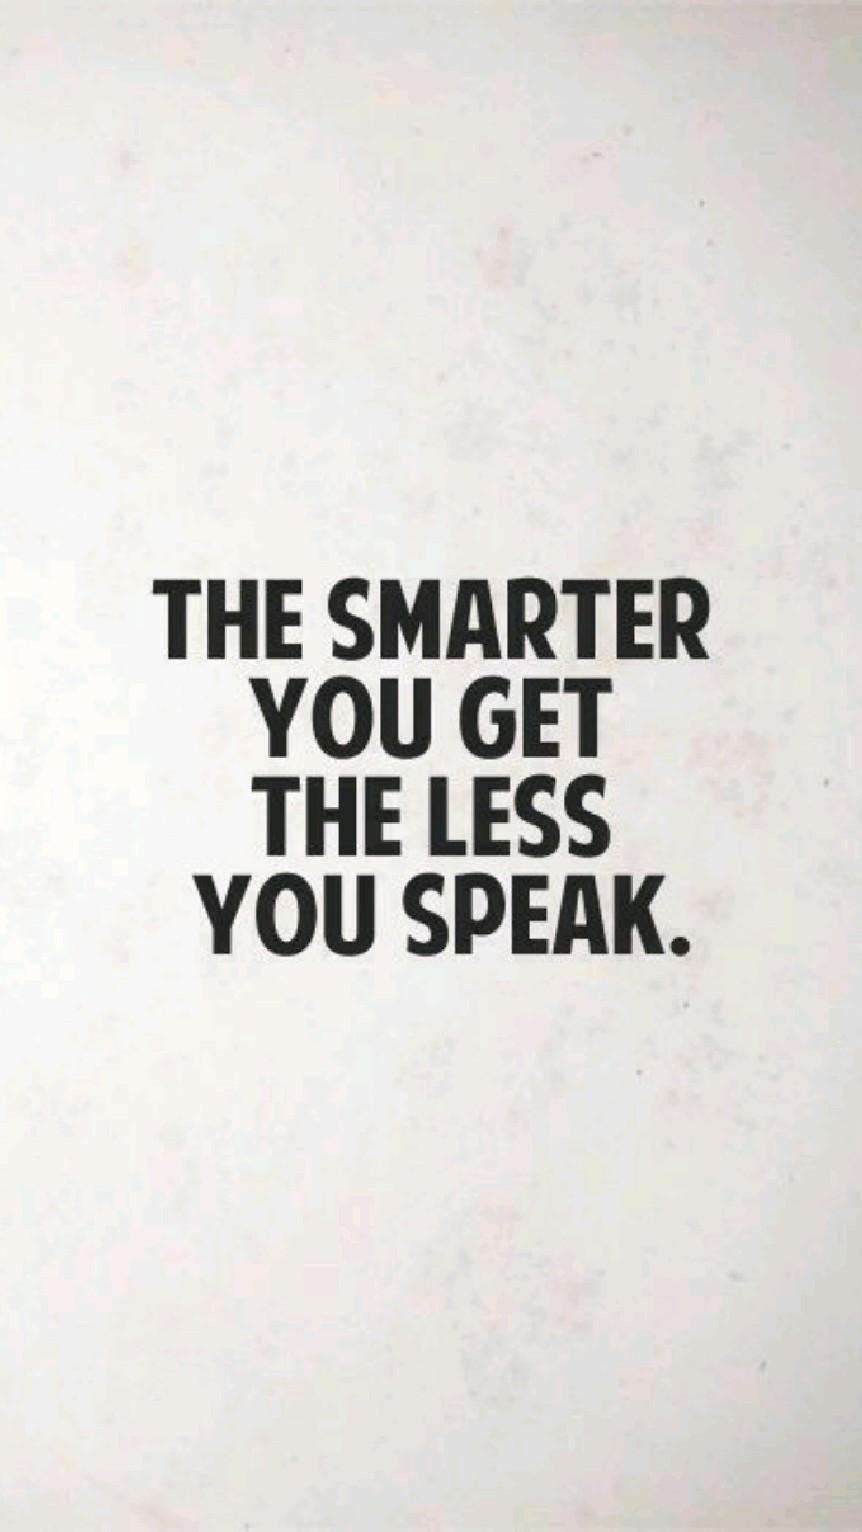 SPEAK WISELY